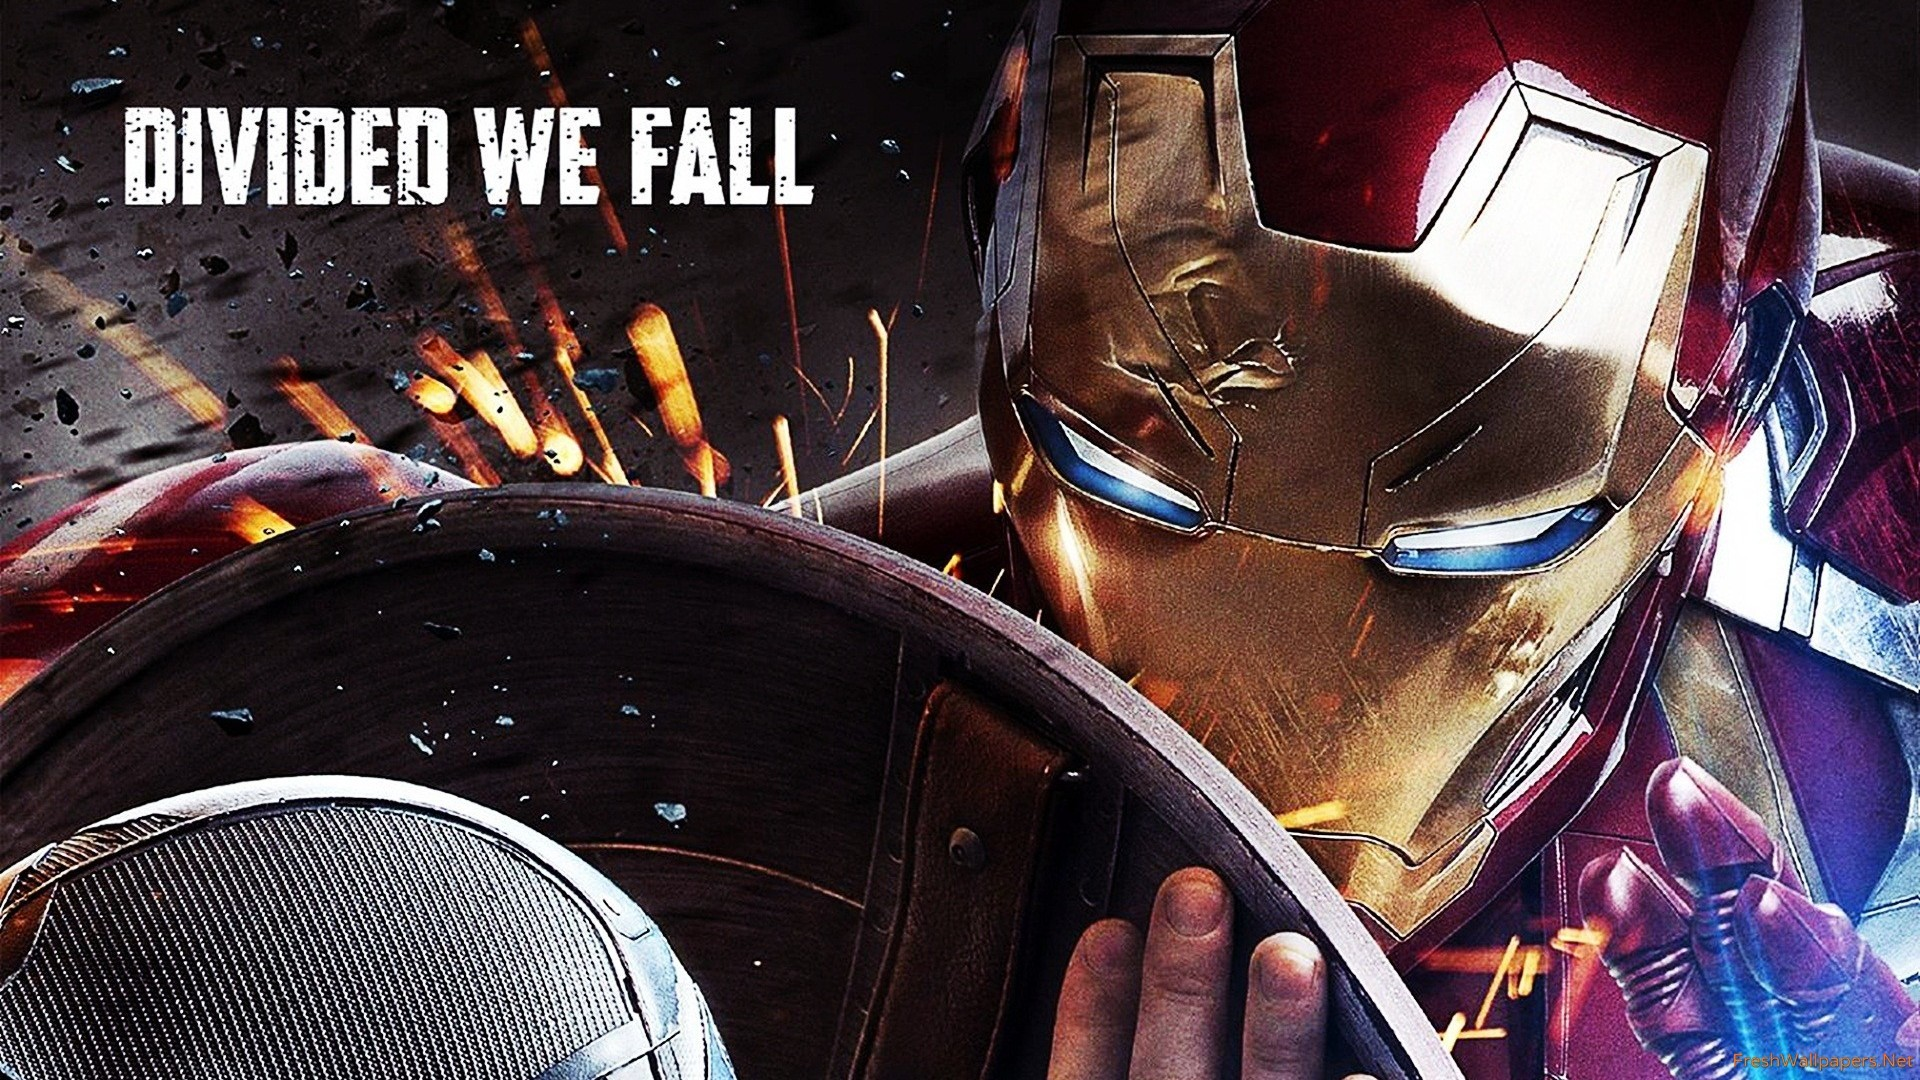 Captain America Civil War Wallpapers Hd: Marvel HD Wallpapers 1080p (74+ Images